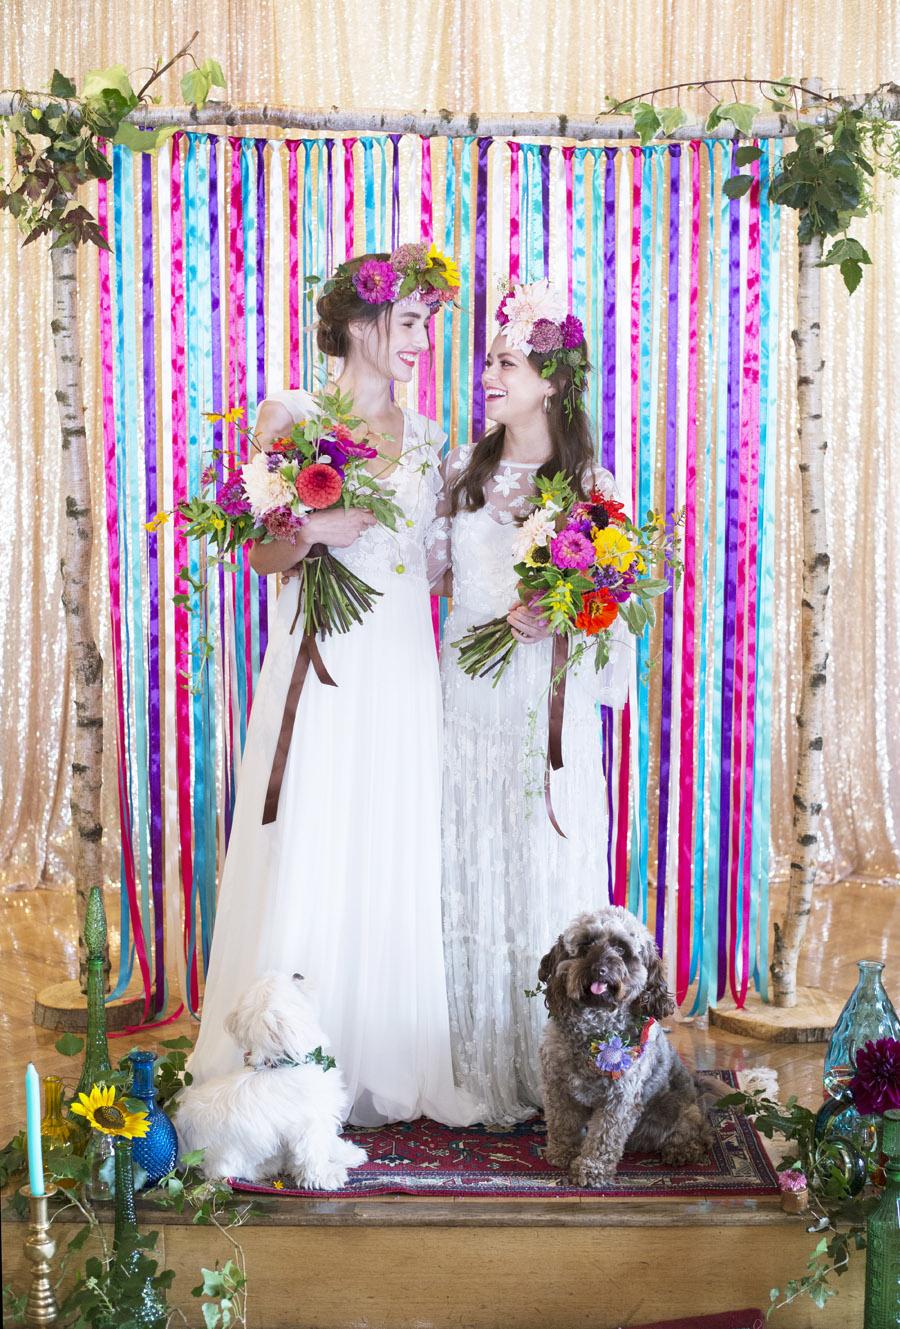 Same sex wedding styling boho chic festival inspiration - image credit Emma Hall Photography (6)